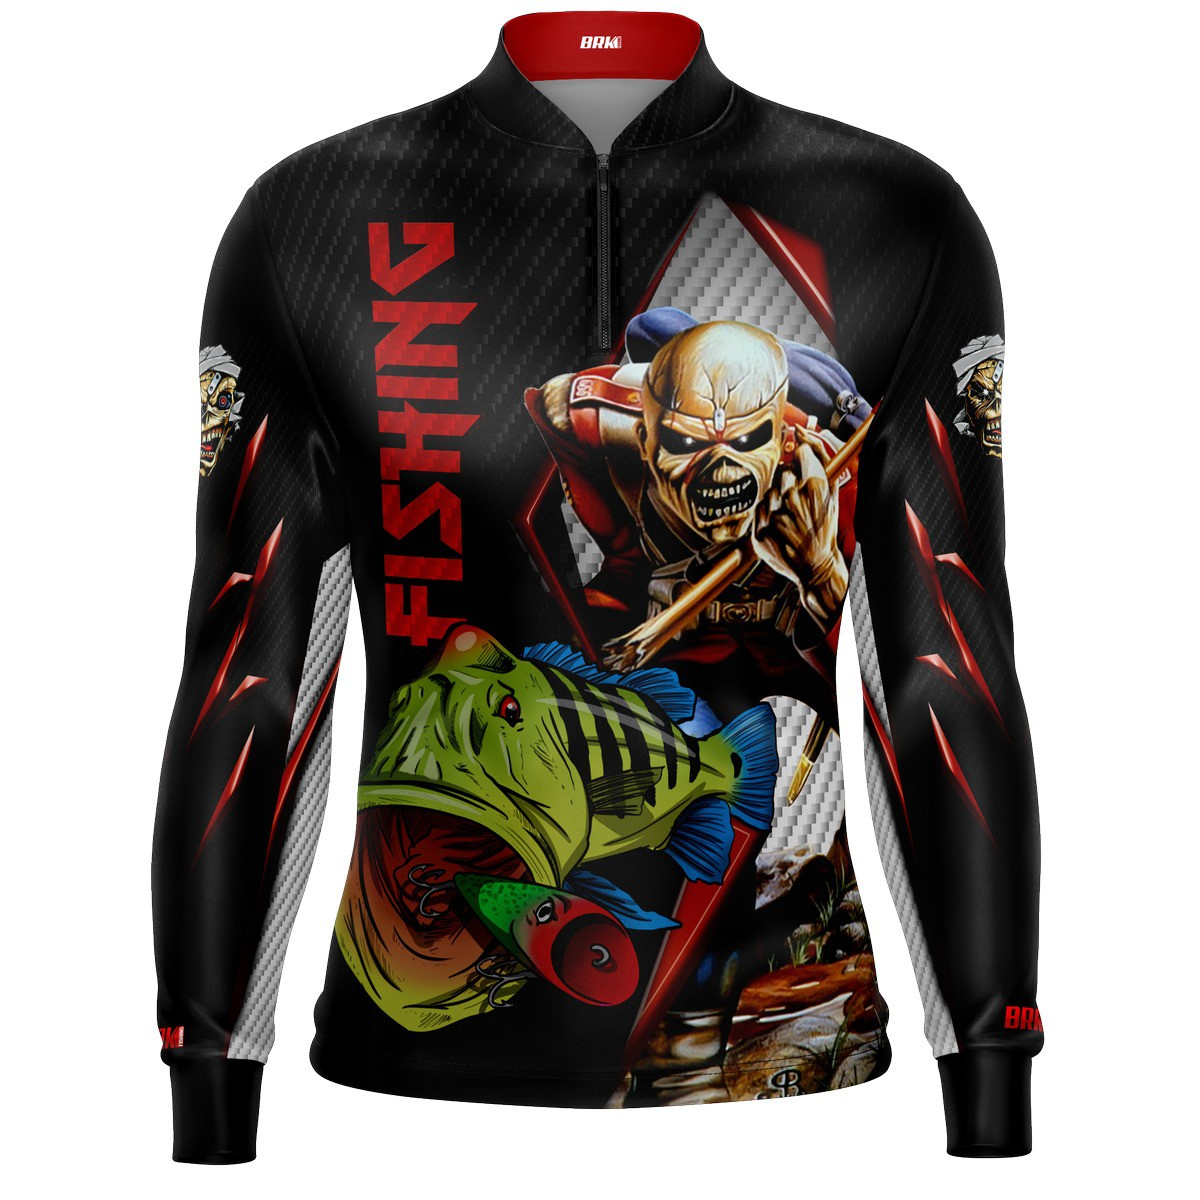 Camisa de Pesca Tucunaré Eddie Iron Maiden Limited com FPU 50+